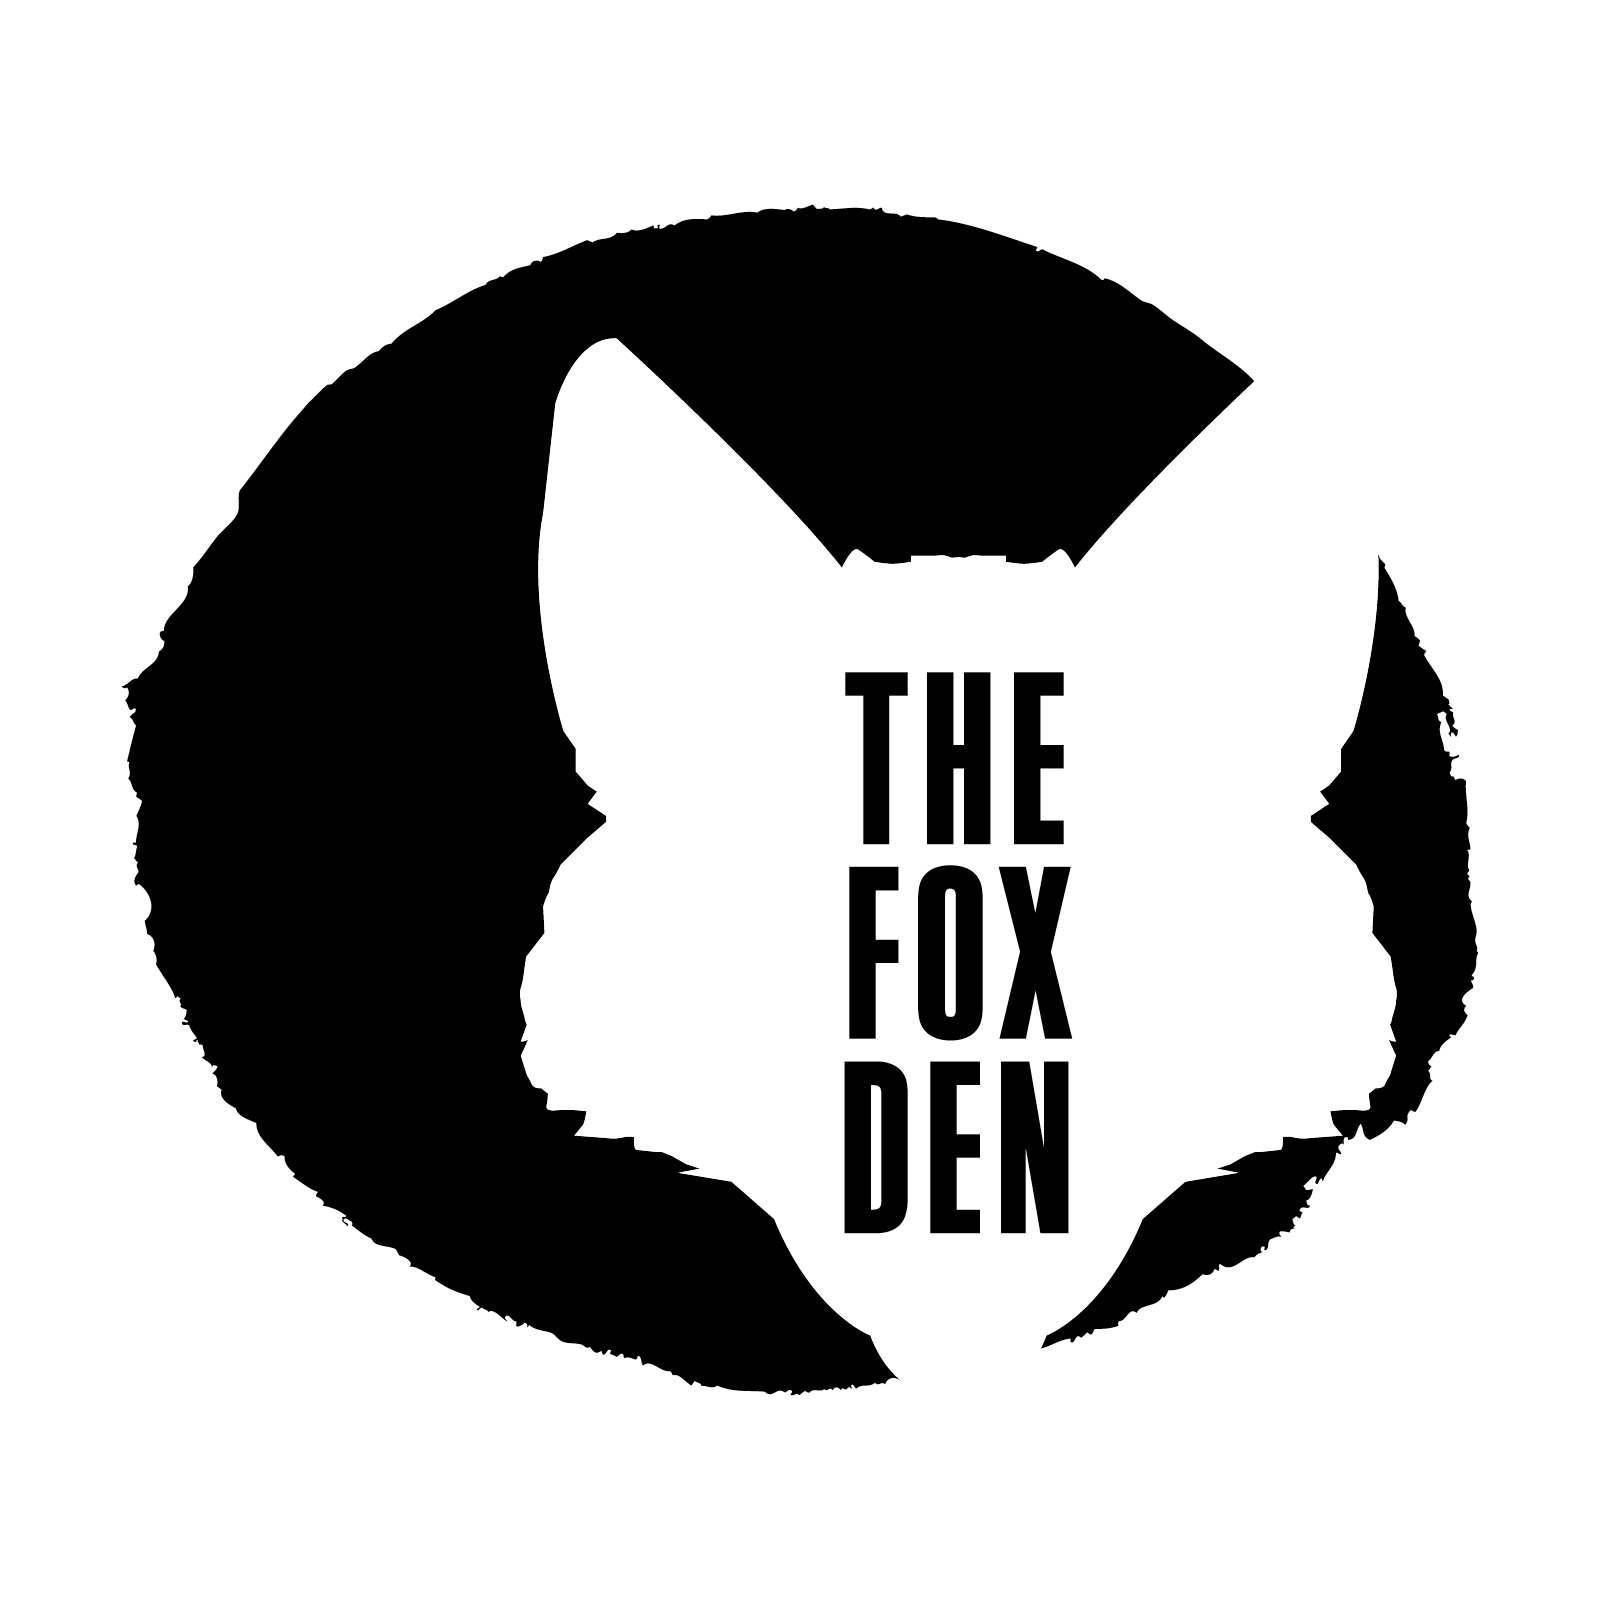 The Fox Den   Branding   By James-Lee Duffy